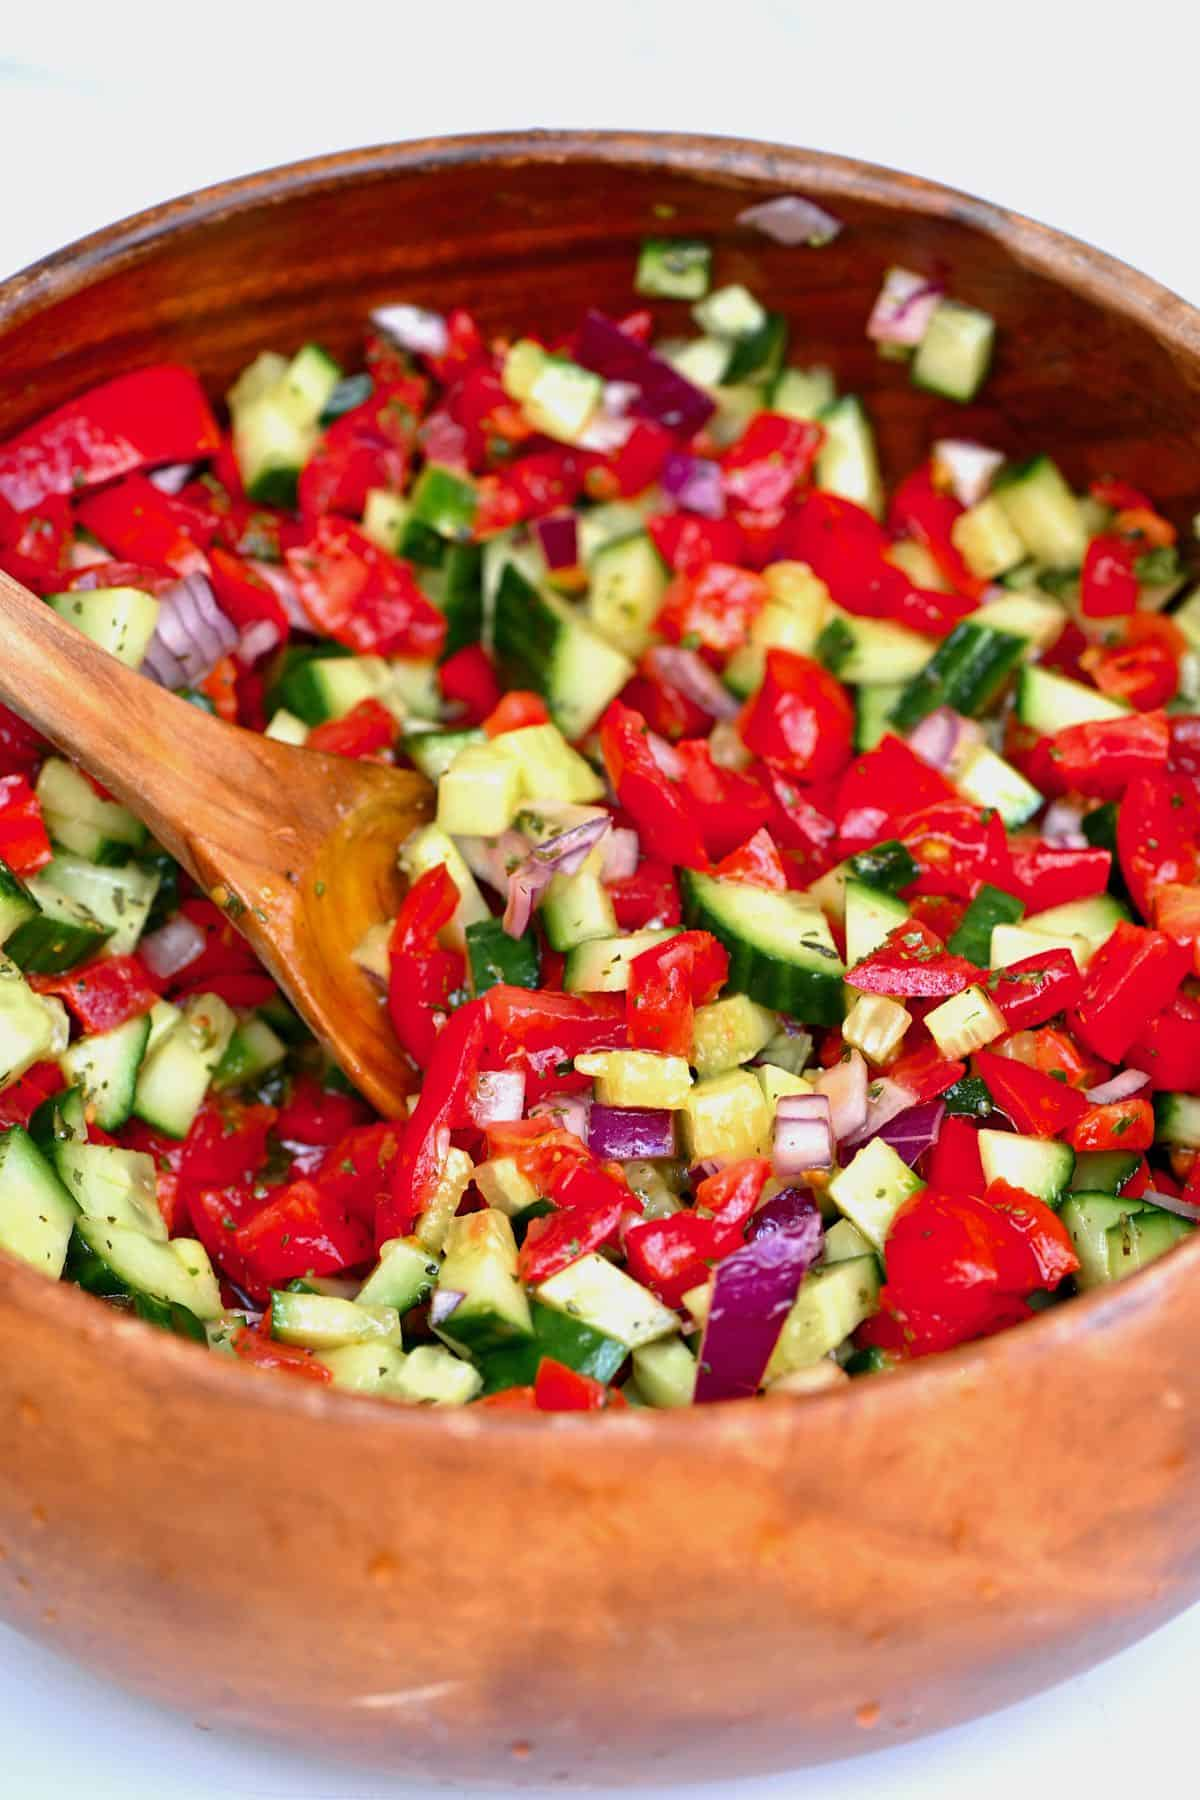 Mixing shirazi salad